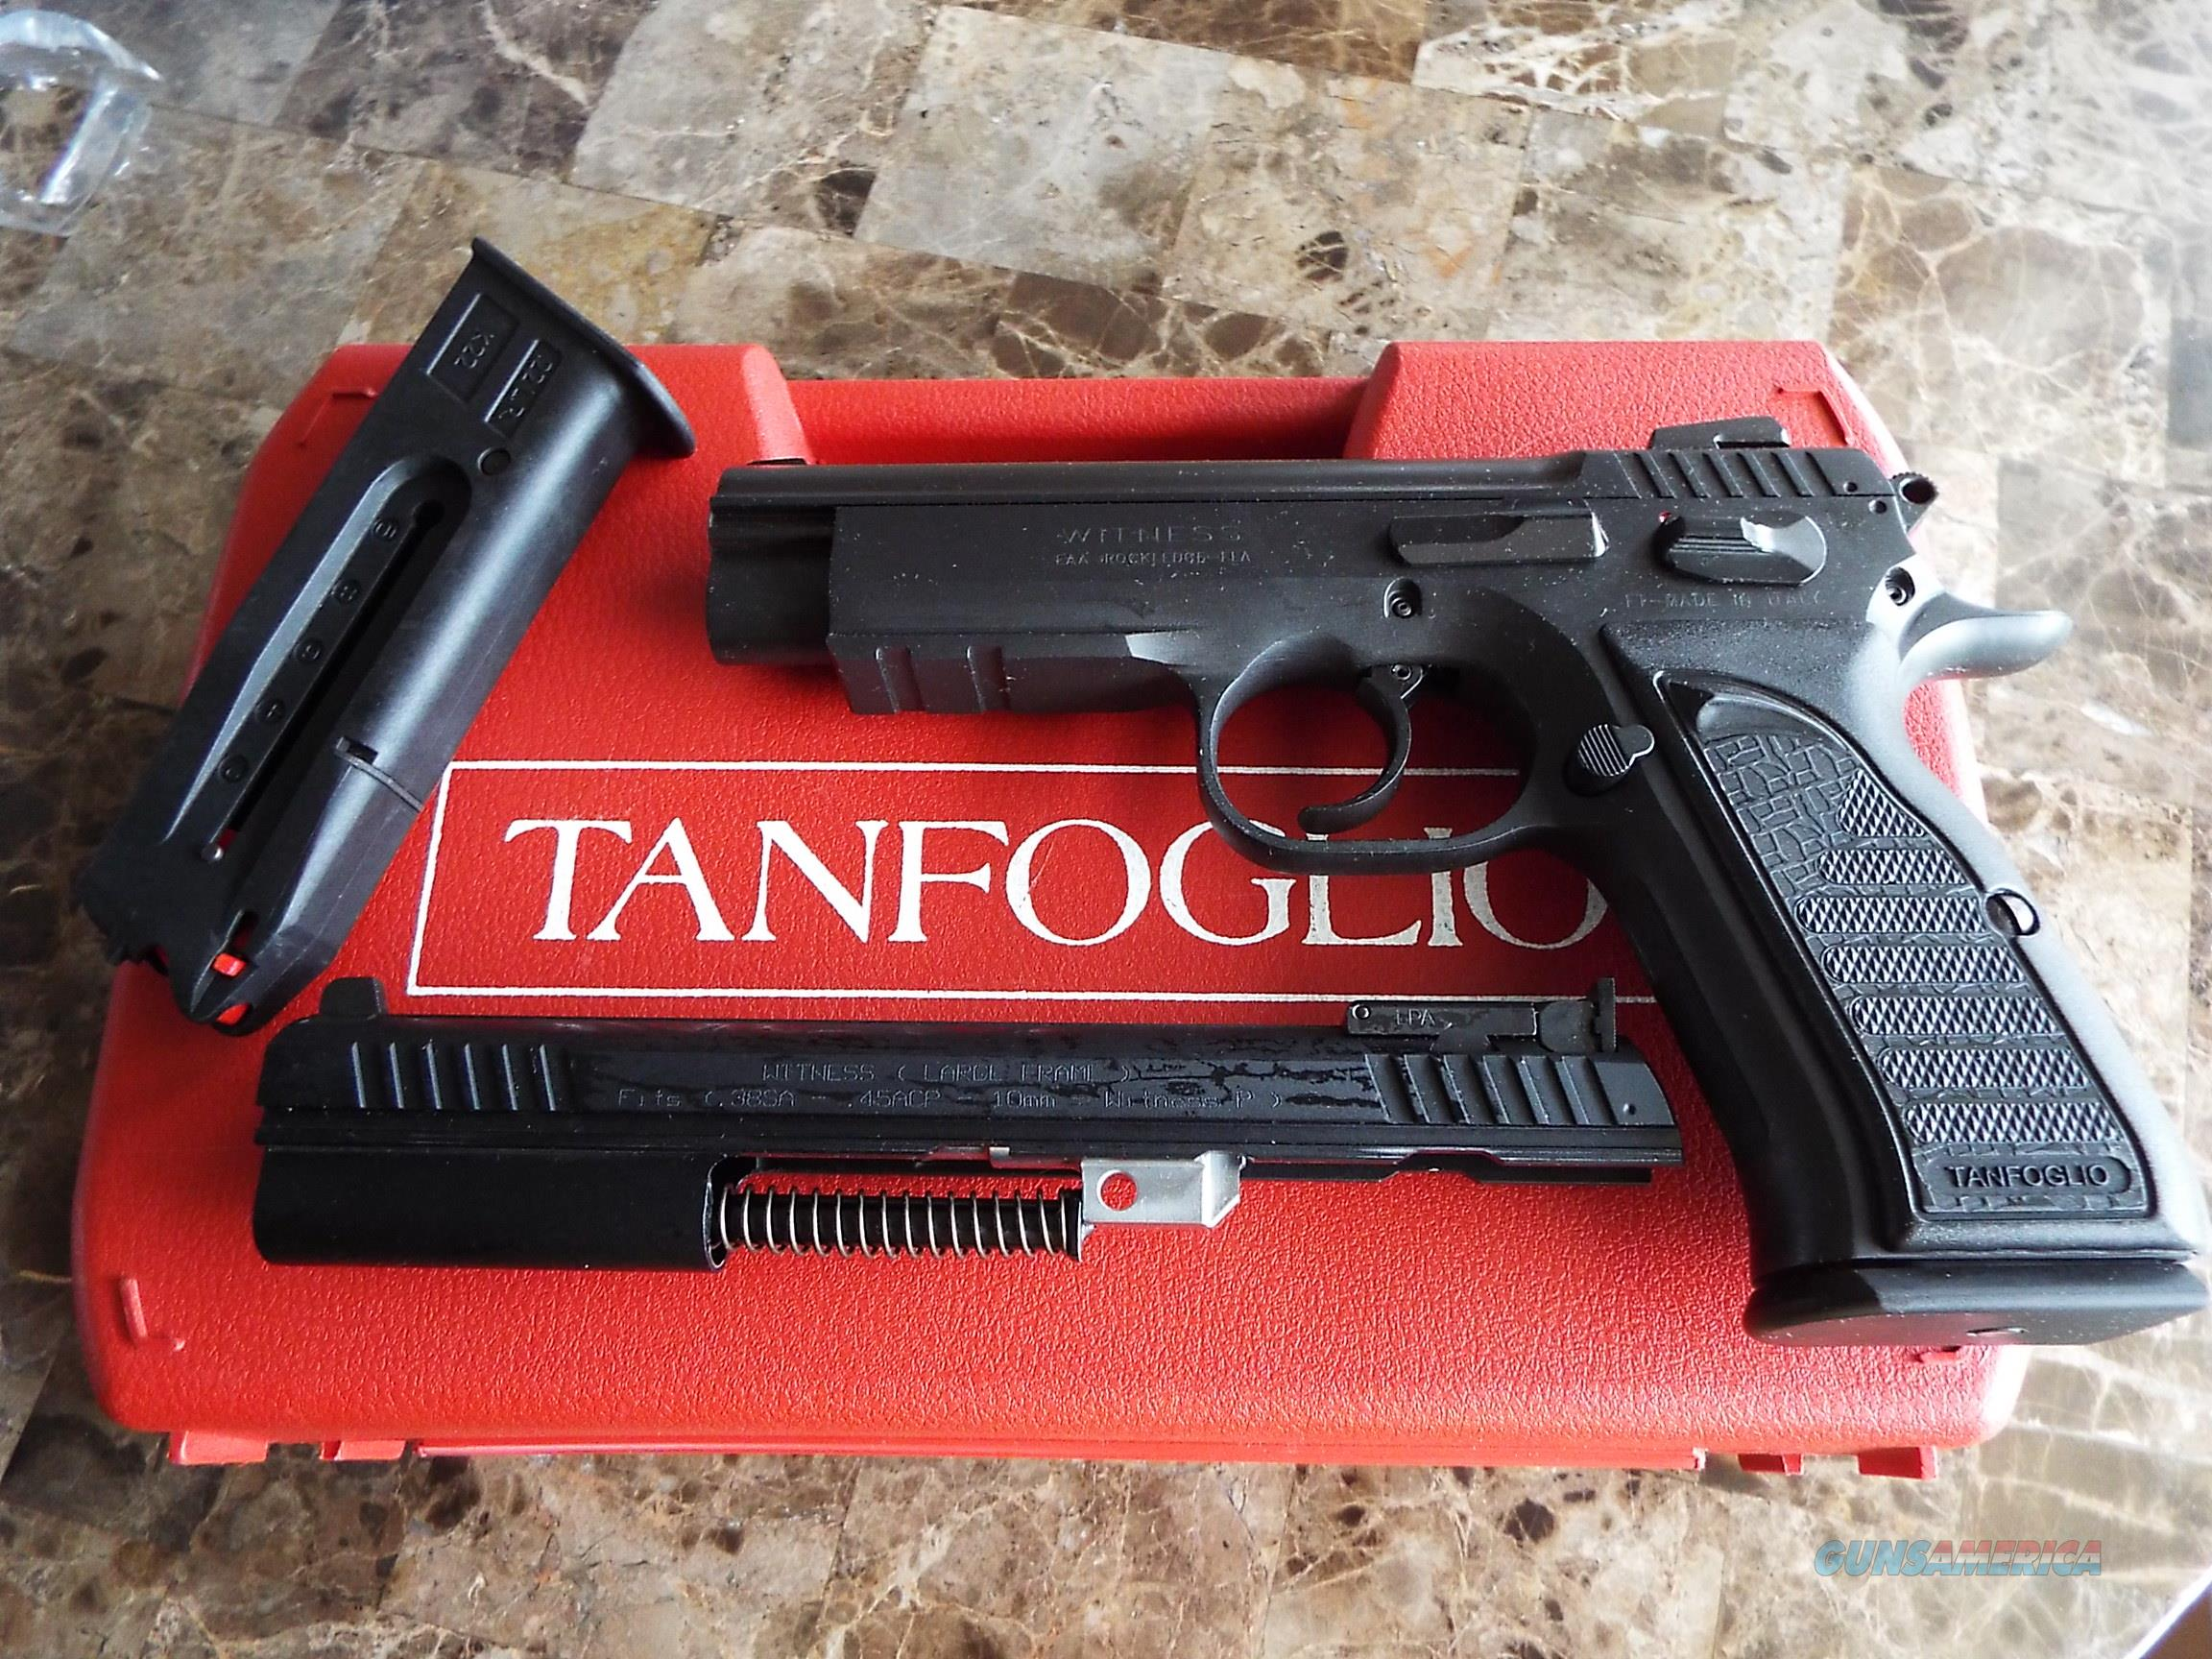 EAA WITNESS Steel FS 45 ACP w/ CONVERSION 22 LR Kit  New!  LAYAWAY OPTION  999119  Guns > Pistols > EAA Pistols > Other